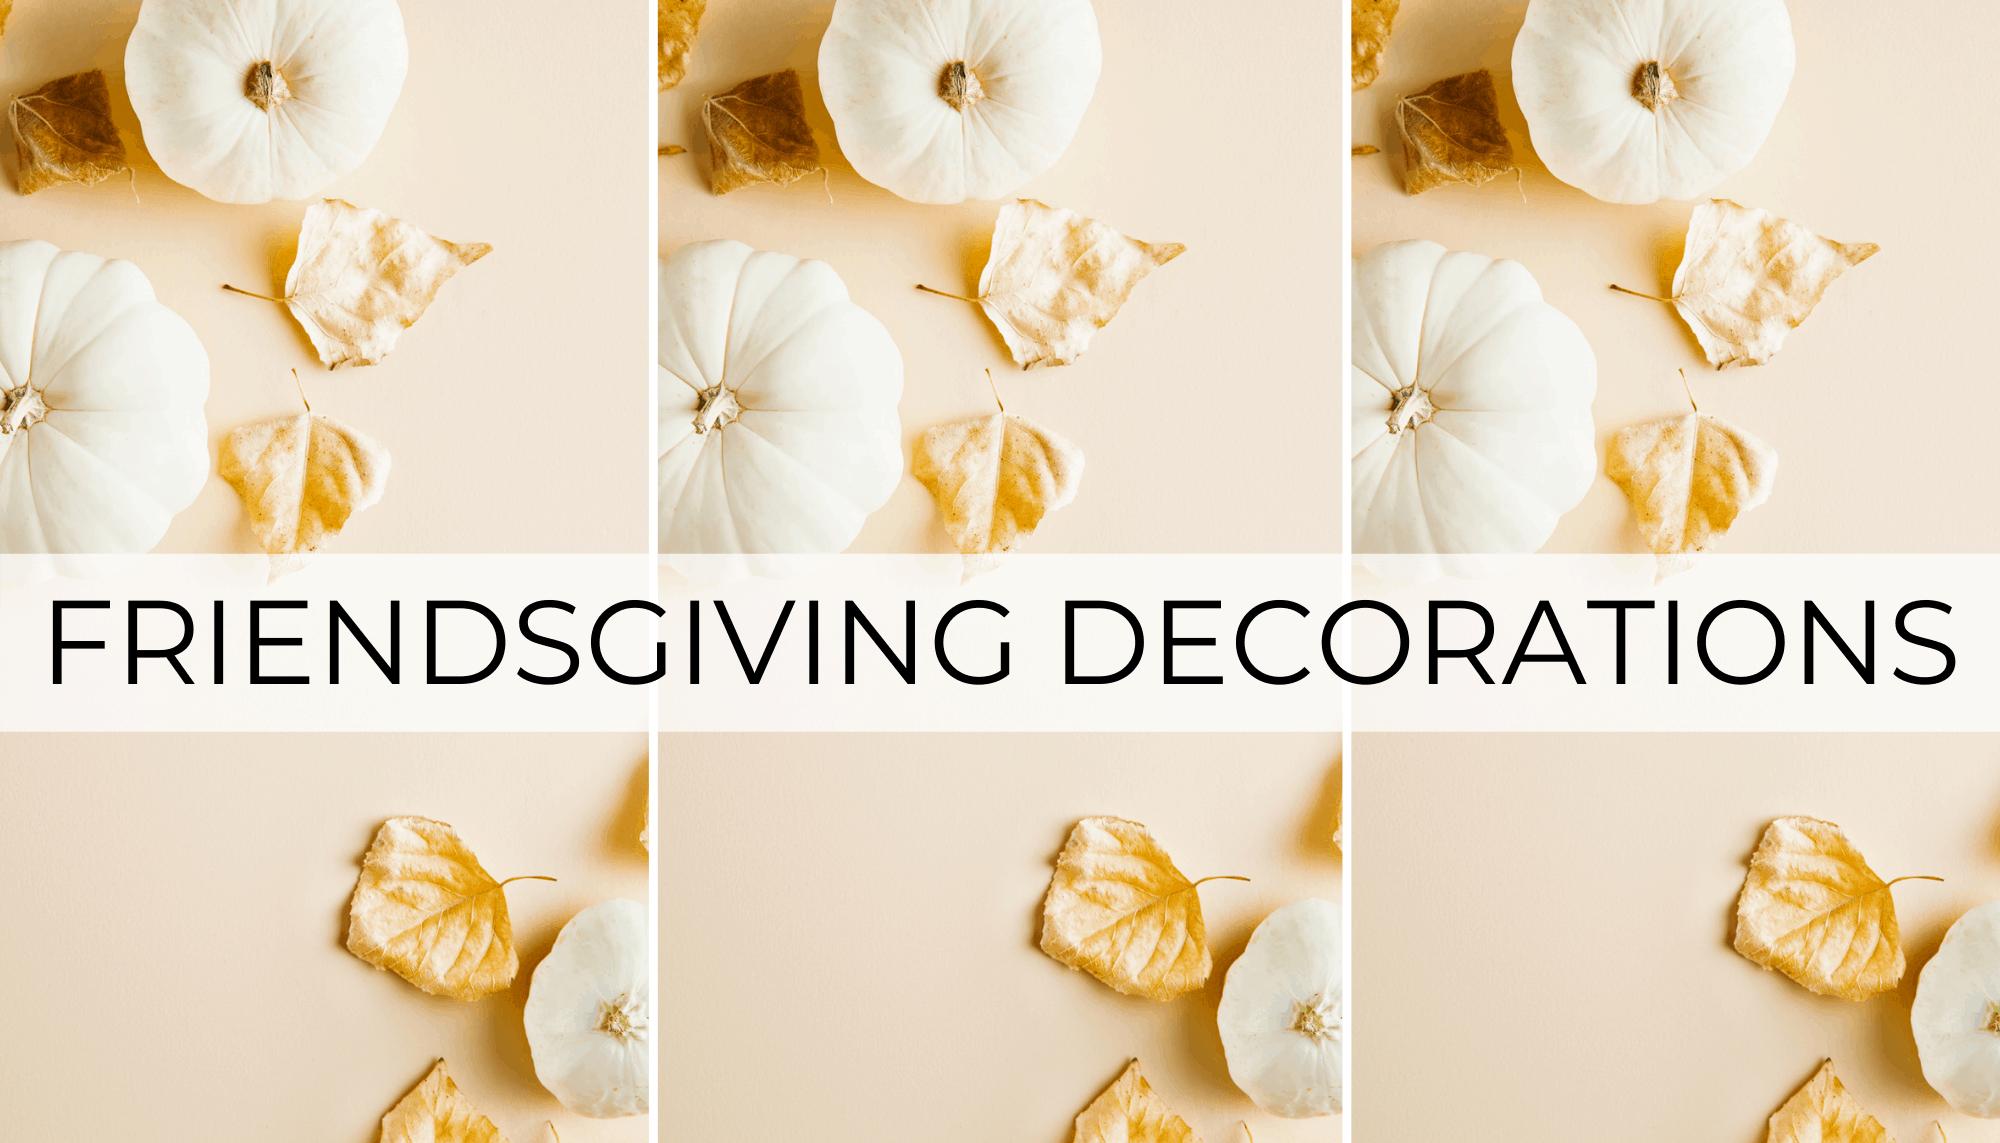 friendsgiving decorations